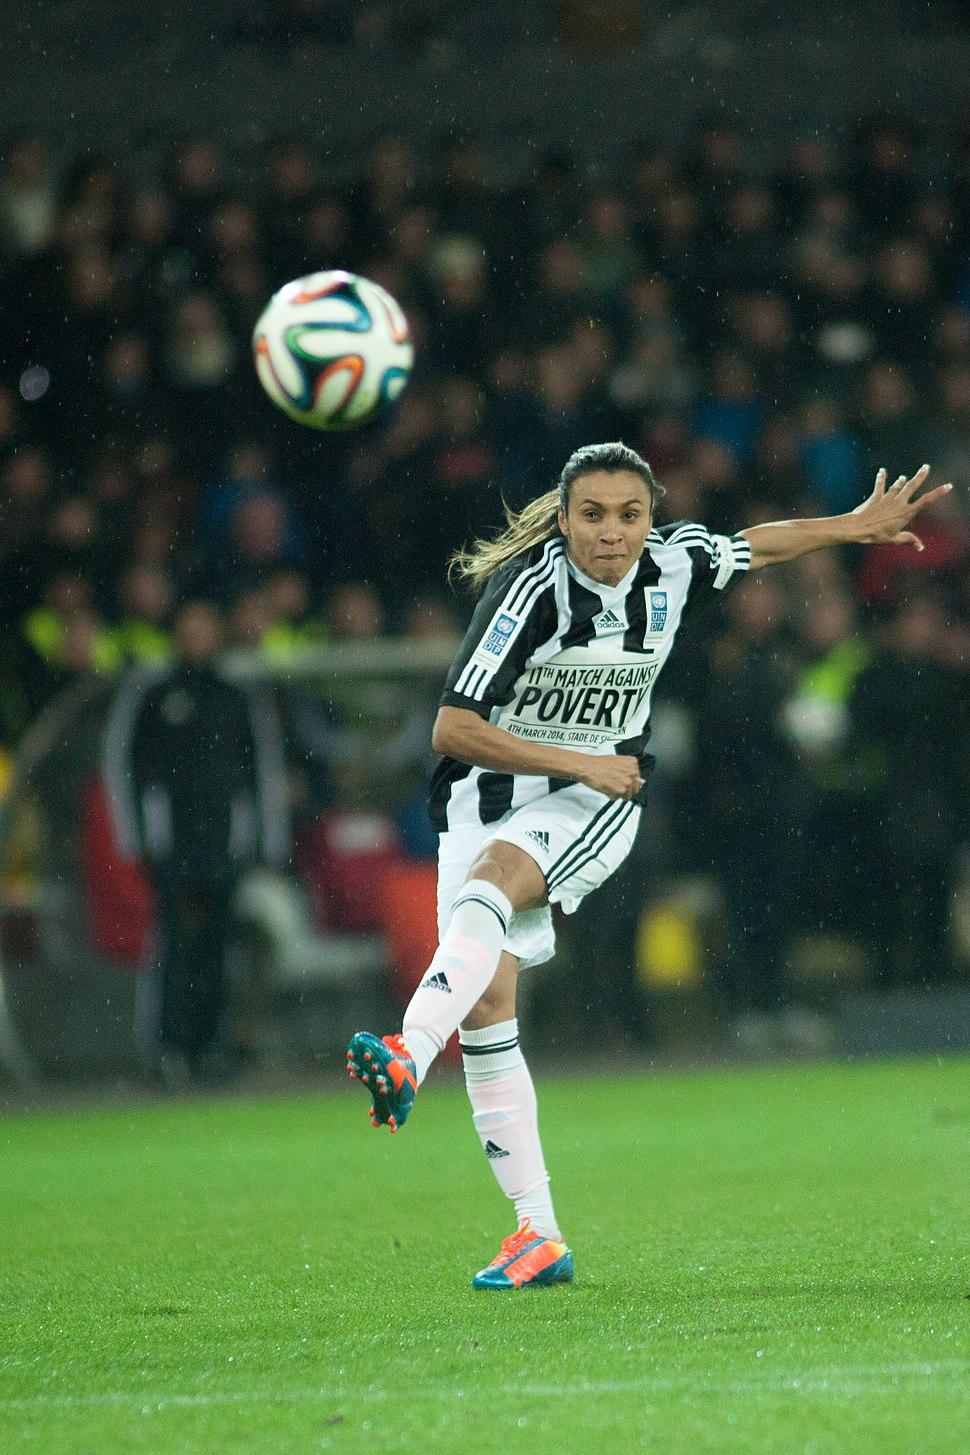 Football against poverty 2014 - Marta